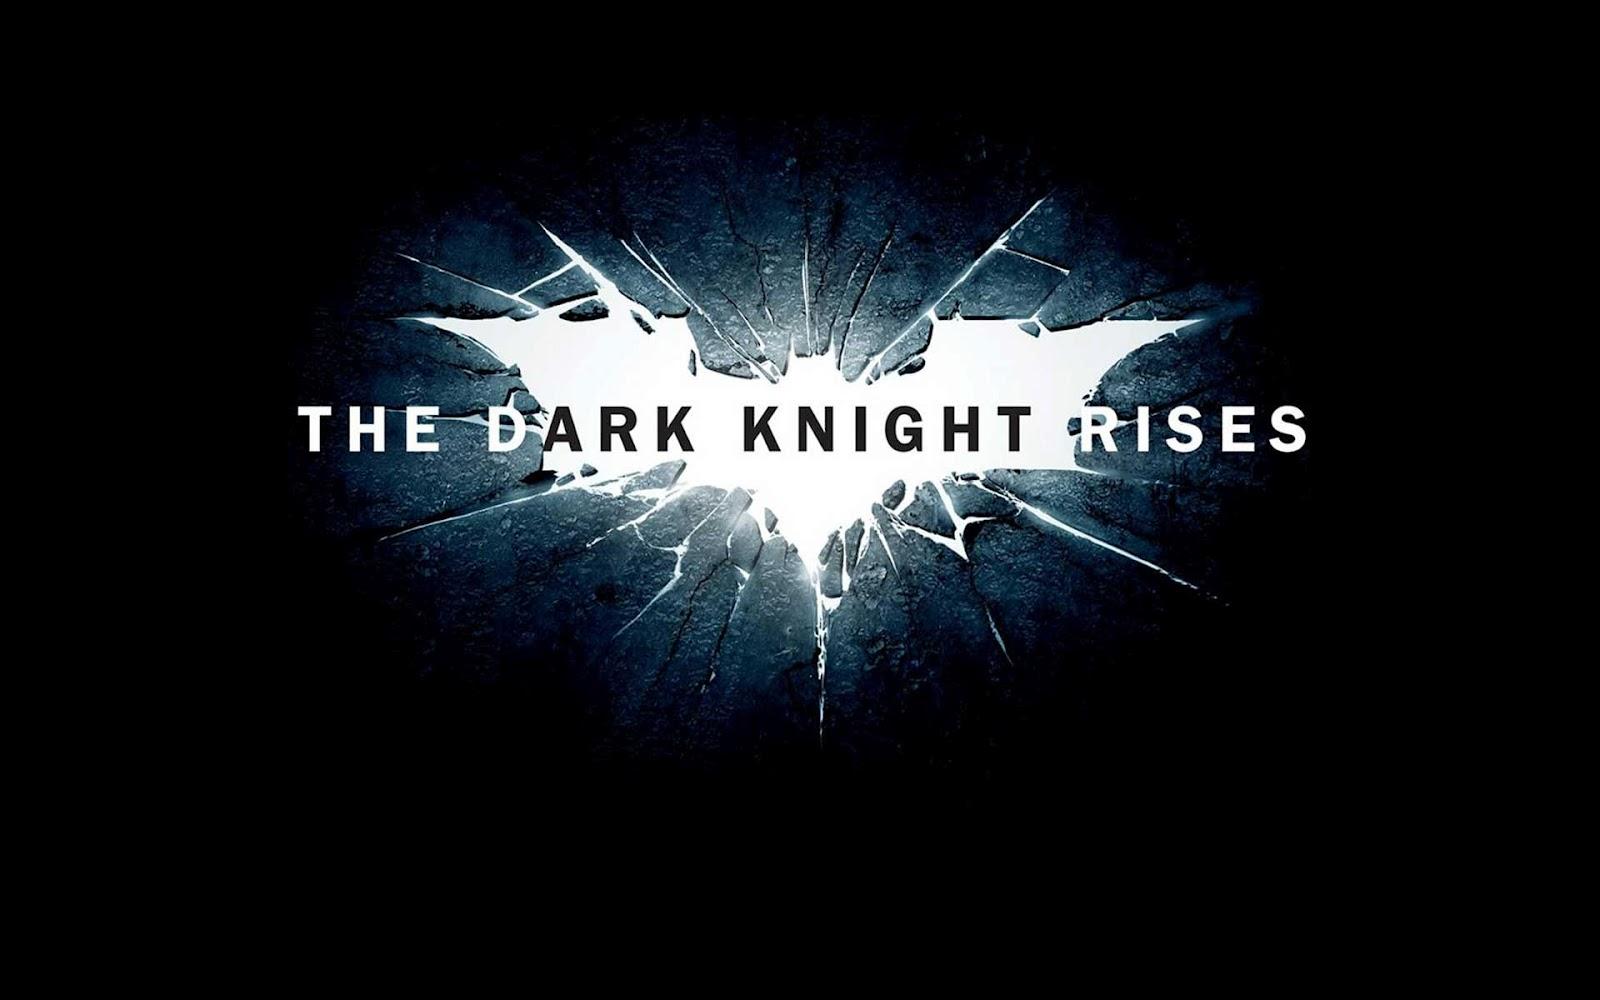 http://2.bp.blogspot.com/-3_H1pGIWLKs/T1NqCCRLnMI/AAAAAAAACA8/sbOnHbxTFo0/s1600/the_dark_knight_rises_wallpaper.jpg